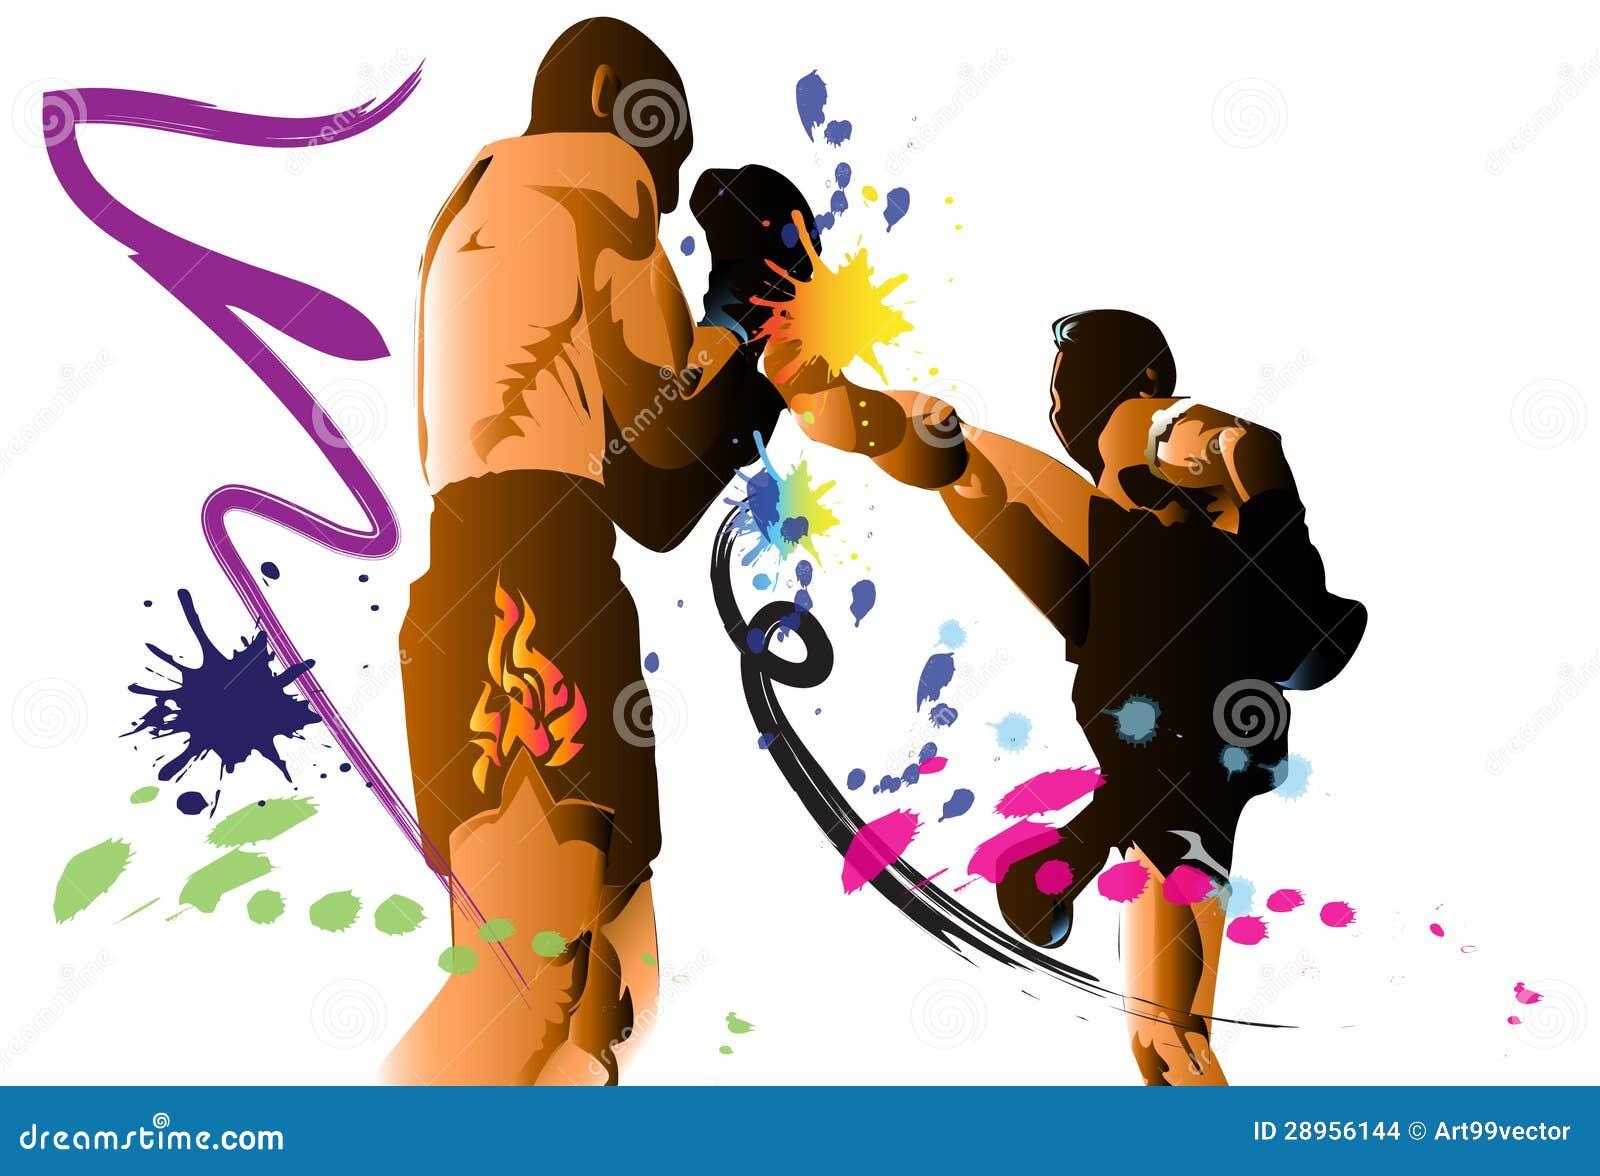 Free download muay thai kickboxing jump photo stock photos download hd